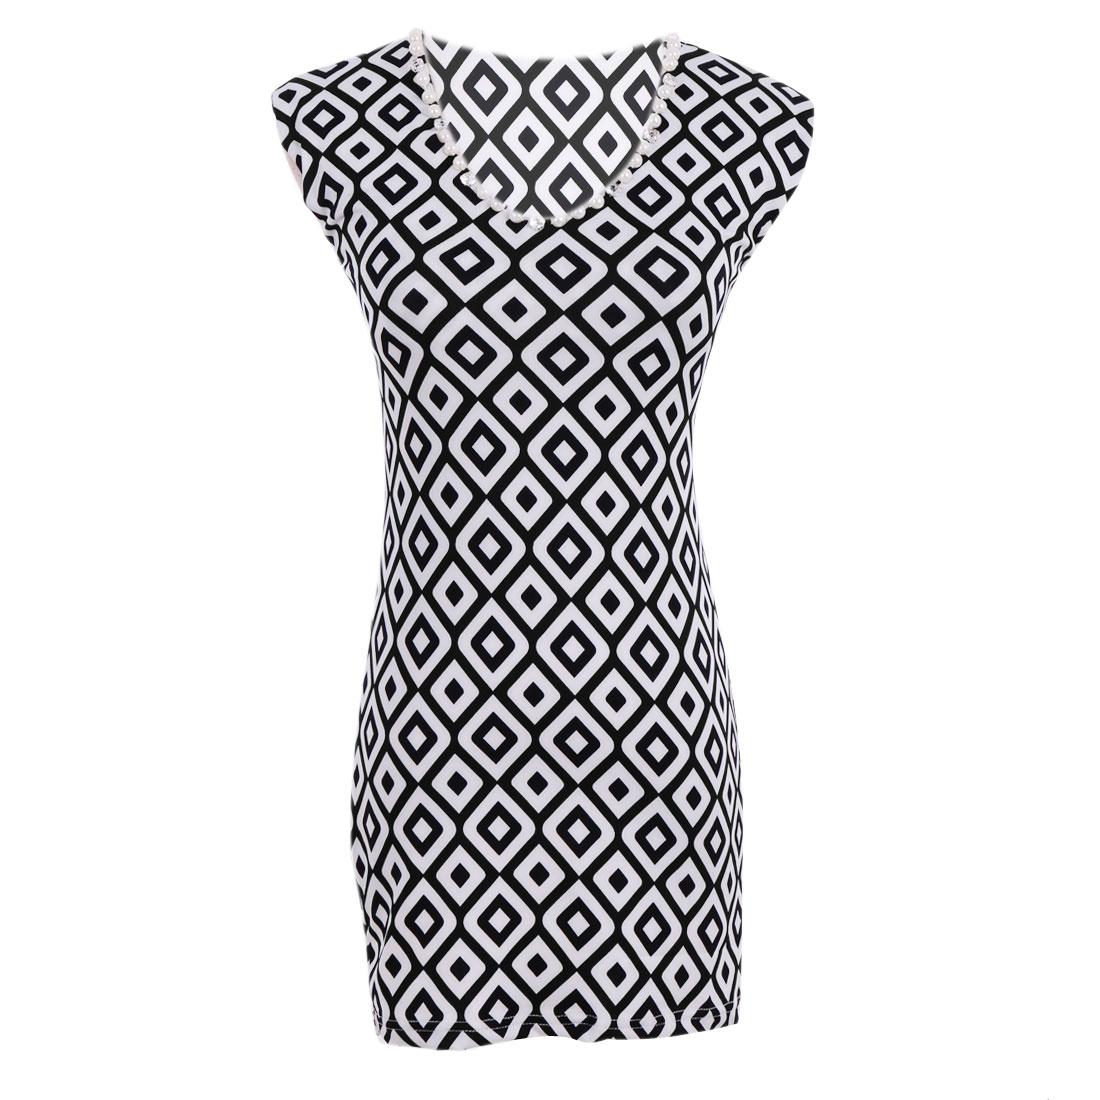 Ladies V Neck Geometric Prints Tank Top White Black XS